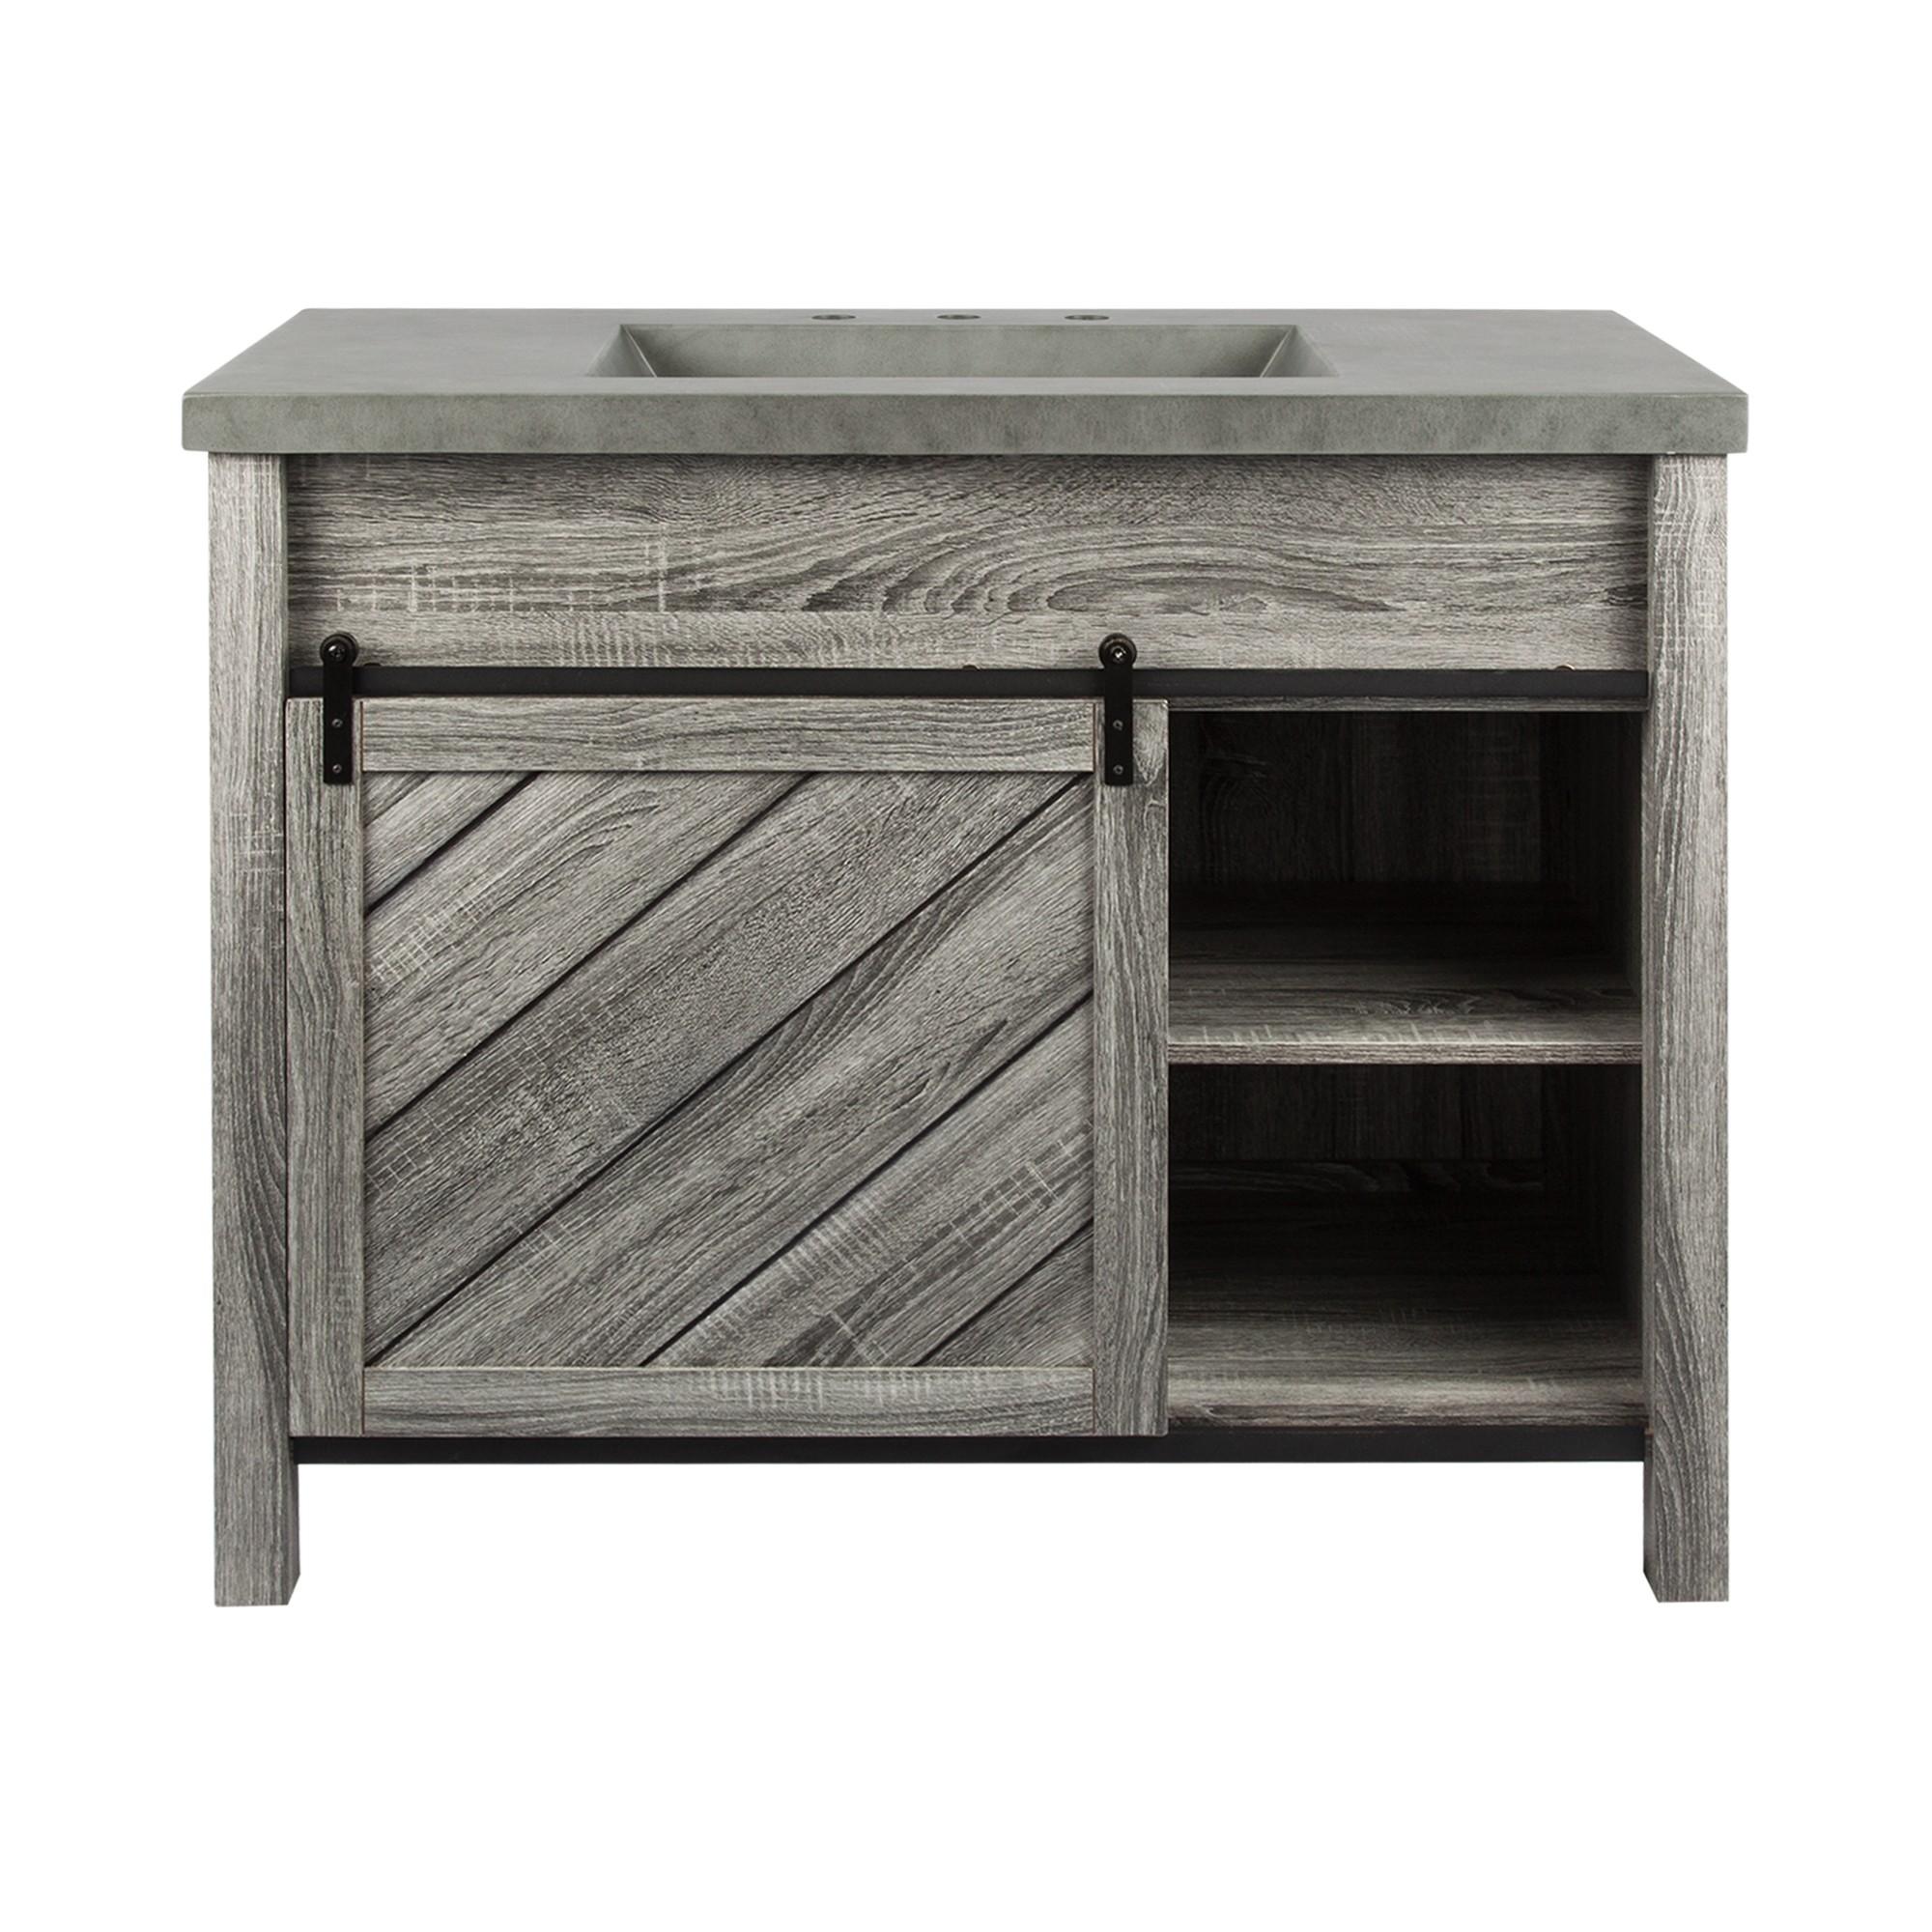 Lennox Bathroom Vanity Cabinet with Basin, 105cm